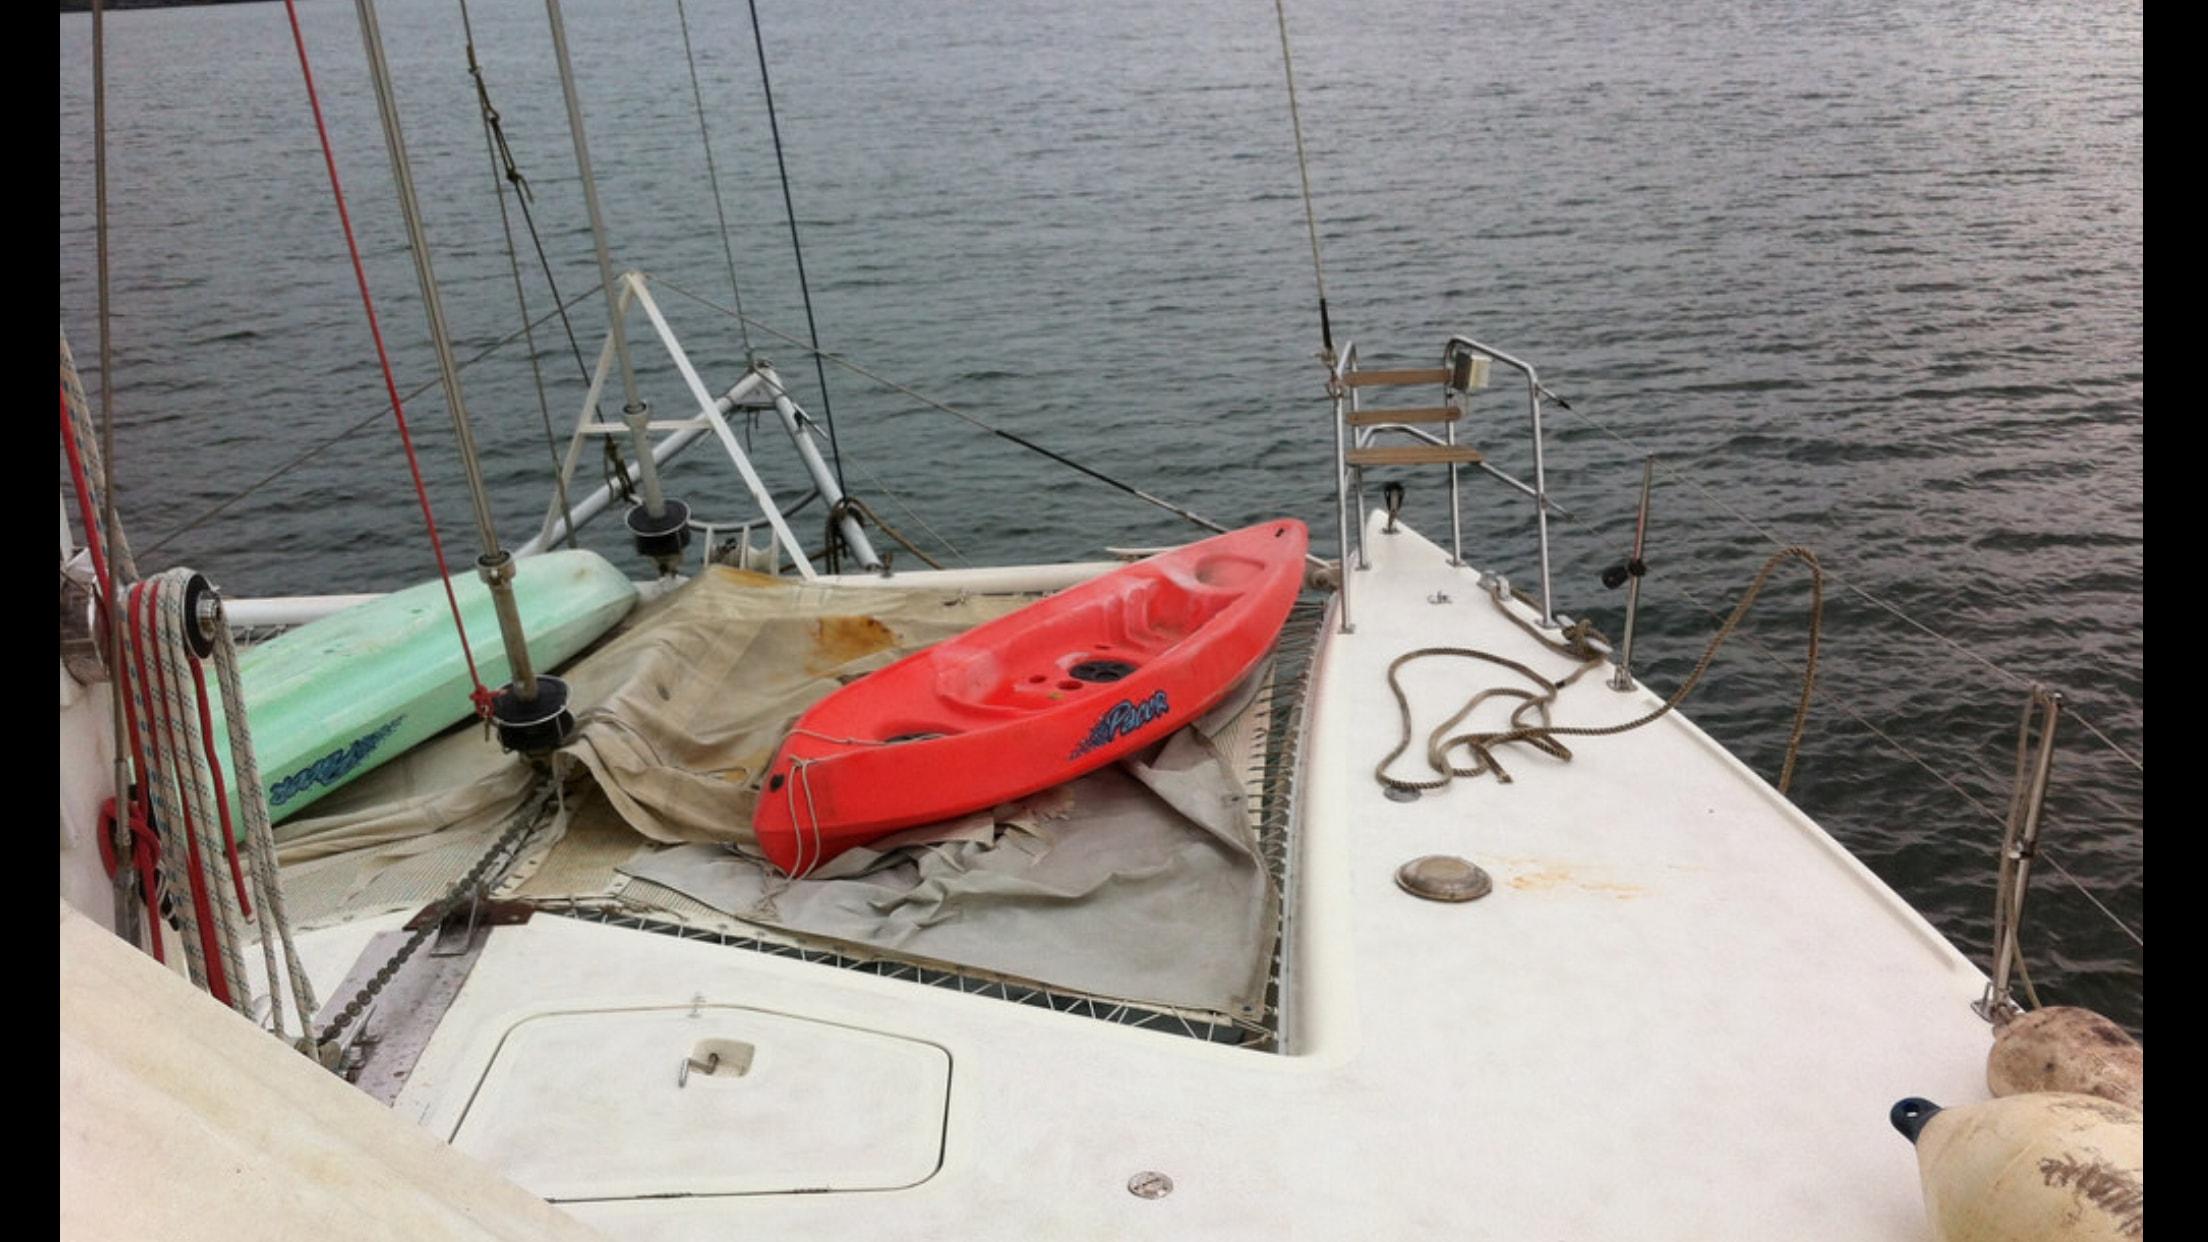 Preowned Sail Catamarans for Sale 1994 St. Francis 44 Mark II Deck & Equipment